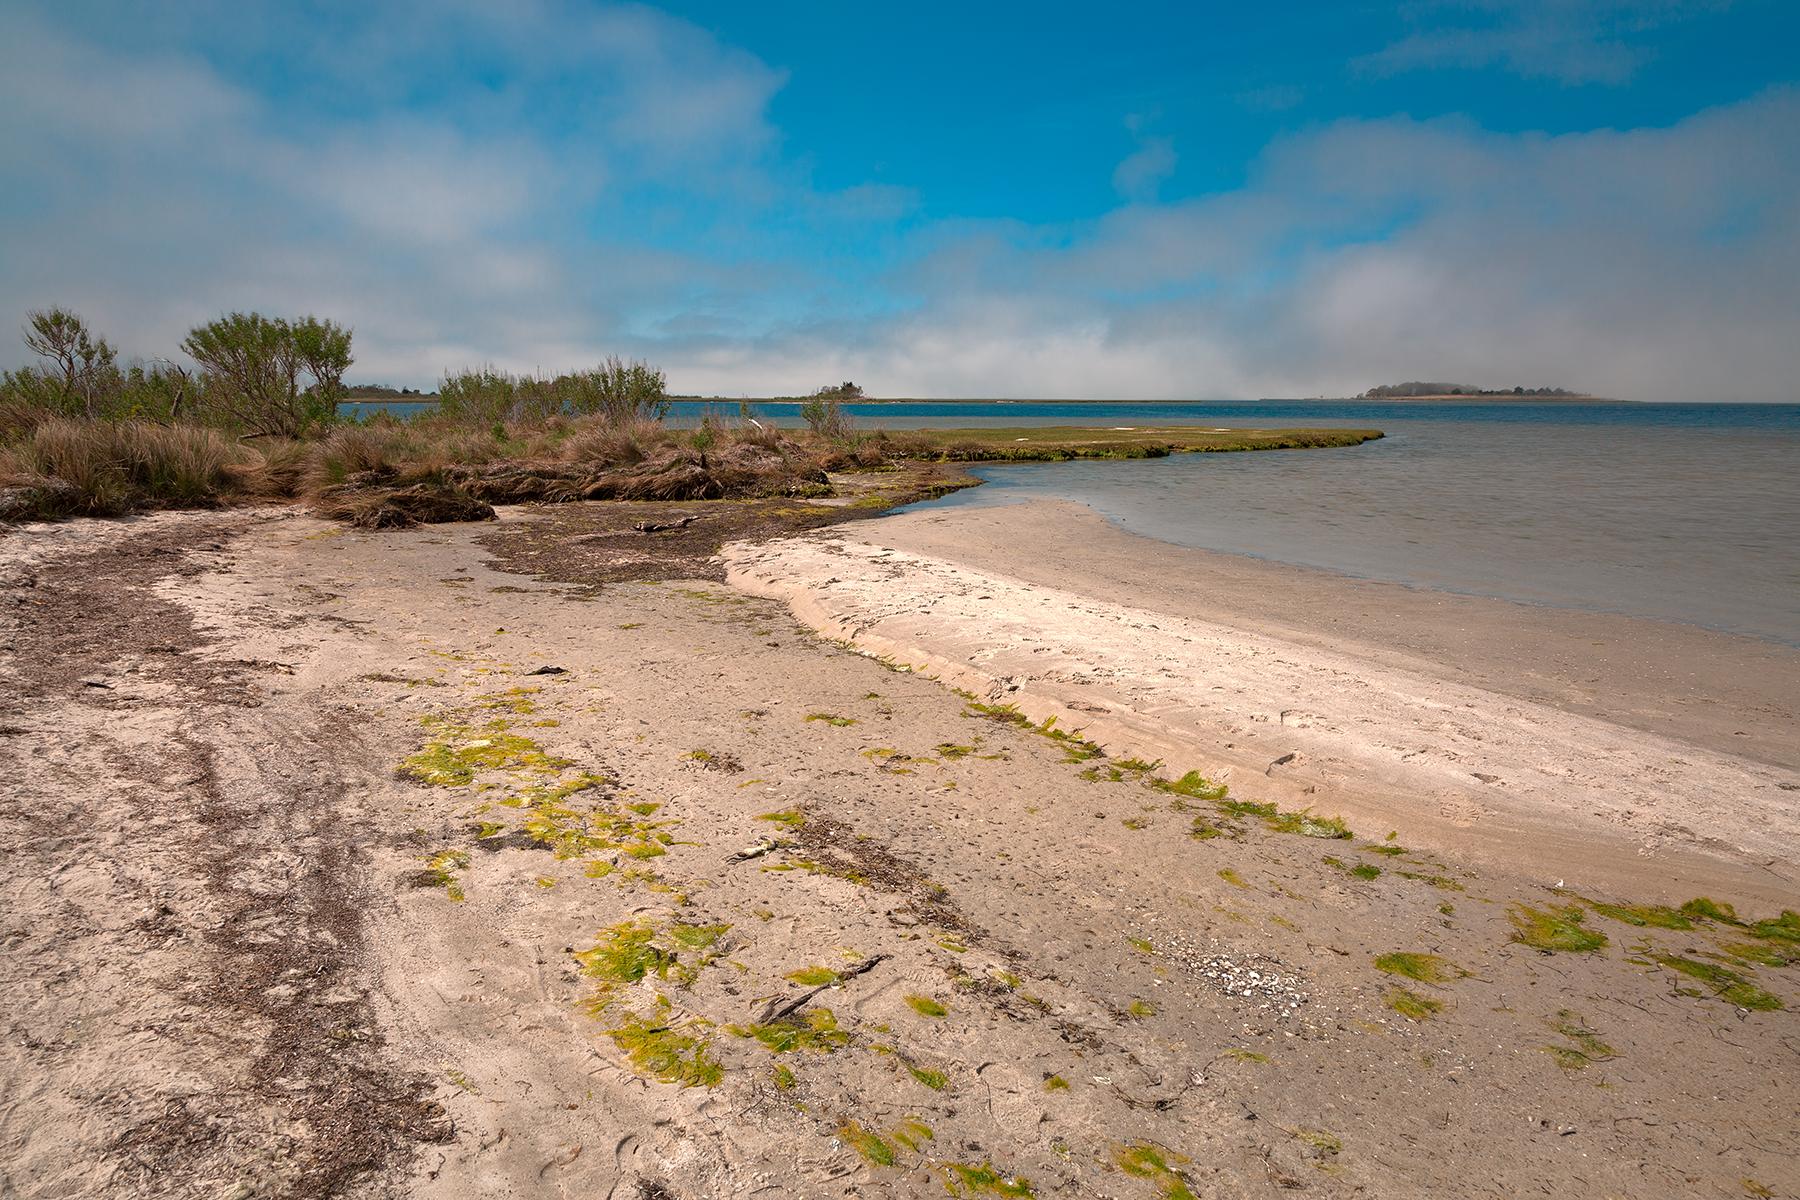 Assateague Island Marsh Beach - HDR, America, Pretty, Seashore, Sea, HQ Photo